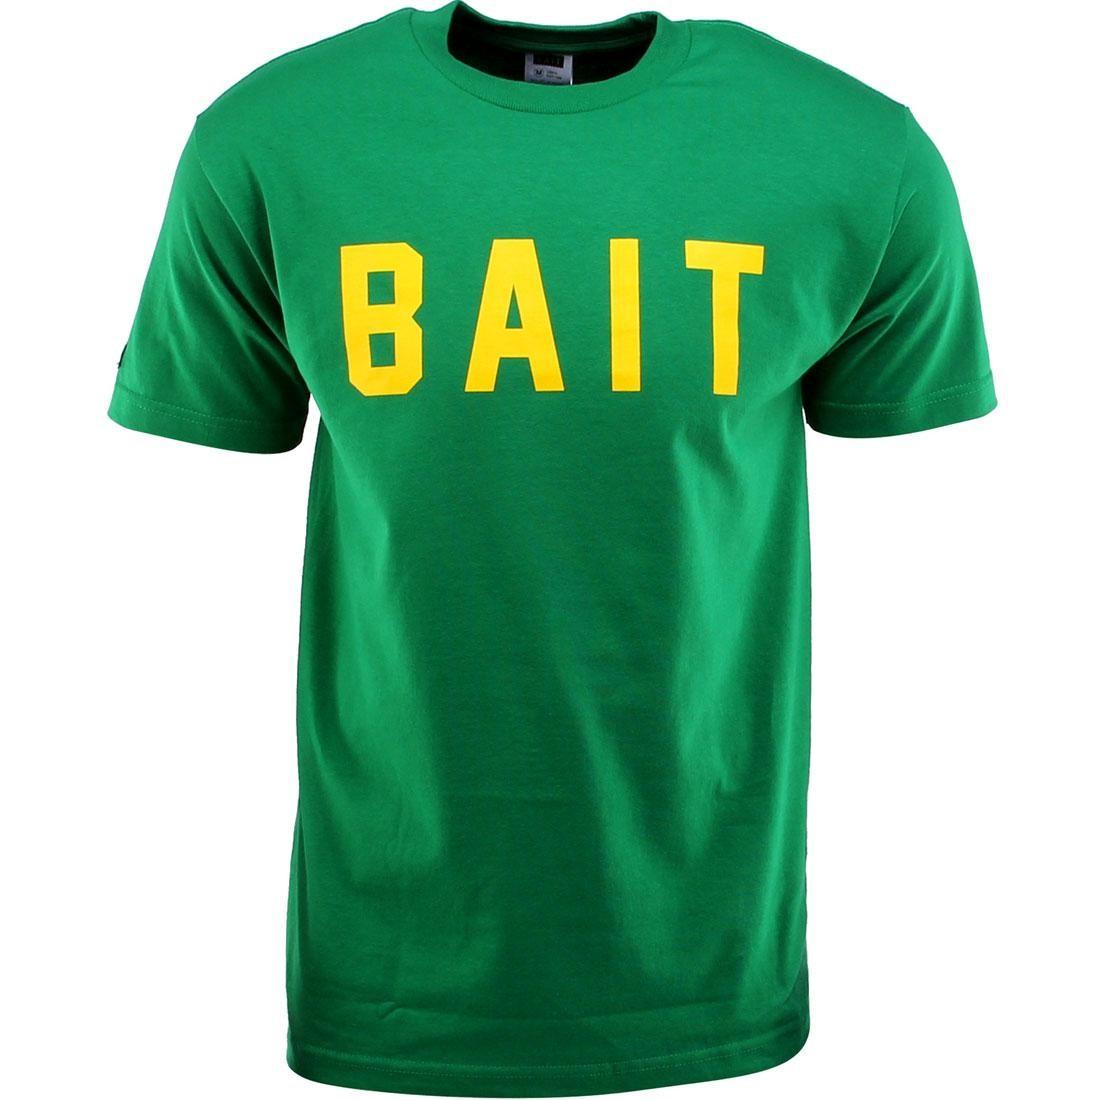 BAIT Logo Tee (green / kelly green / yellow)